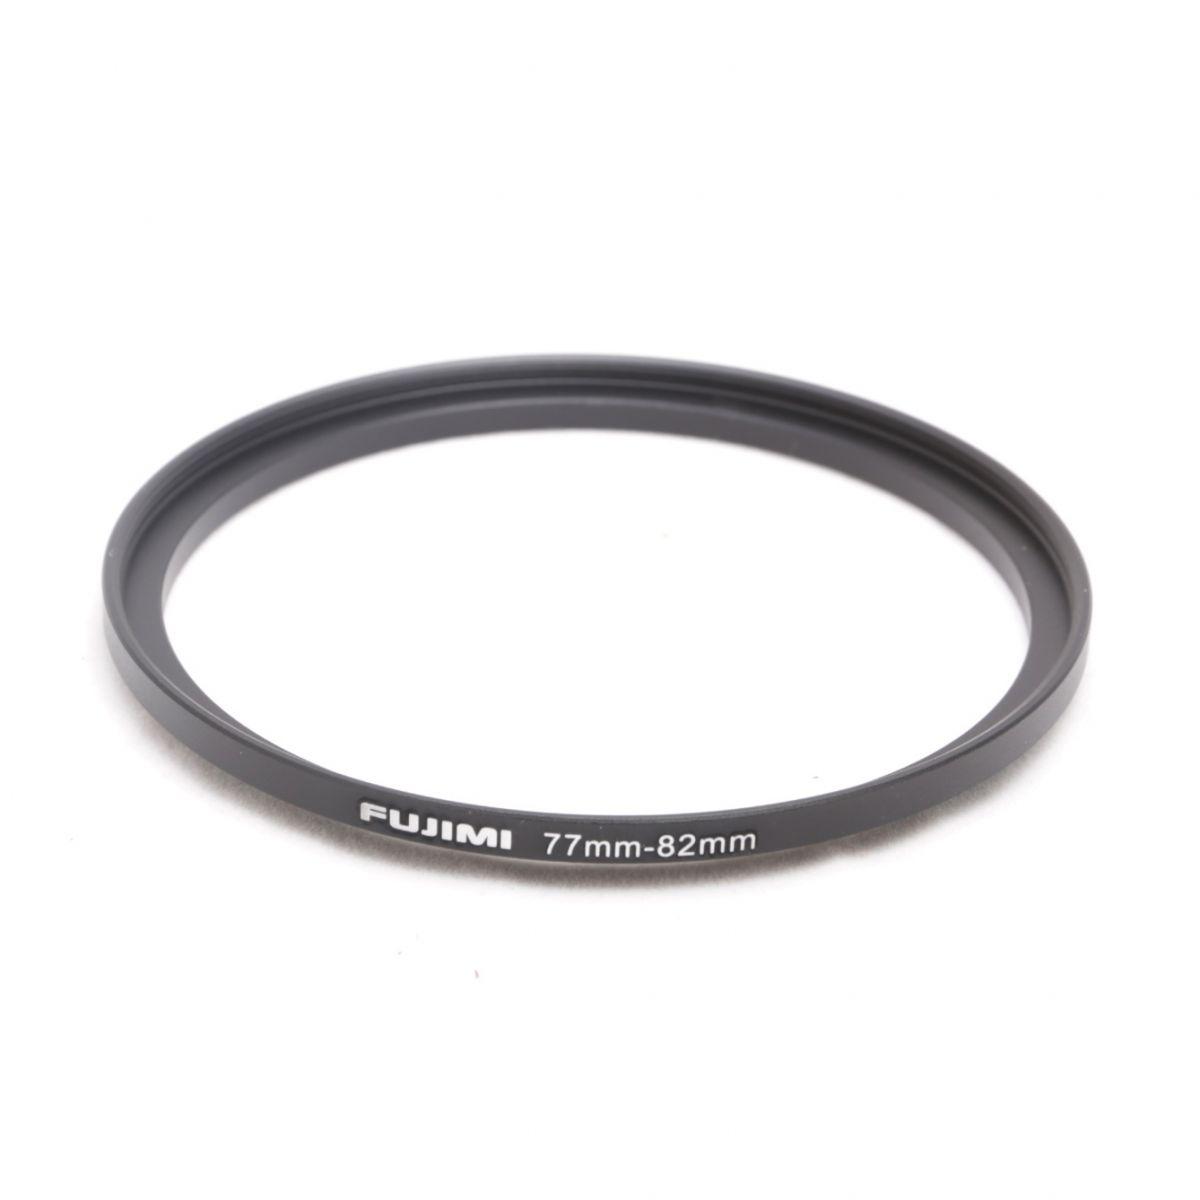 Переходное кольцо Fujimi FRSU-5558 Step-Up Размер 55-58 мм